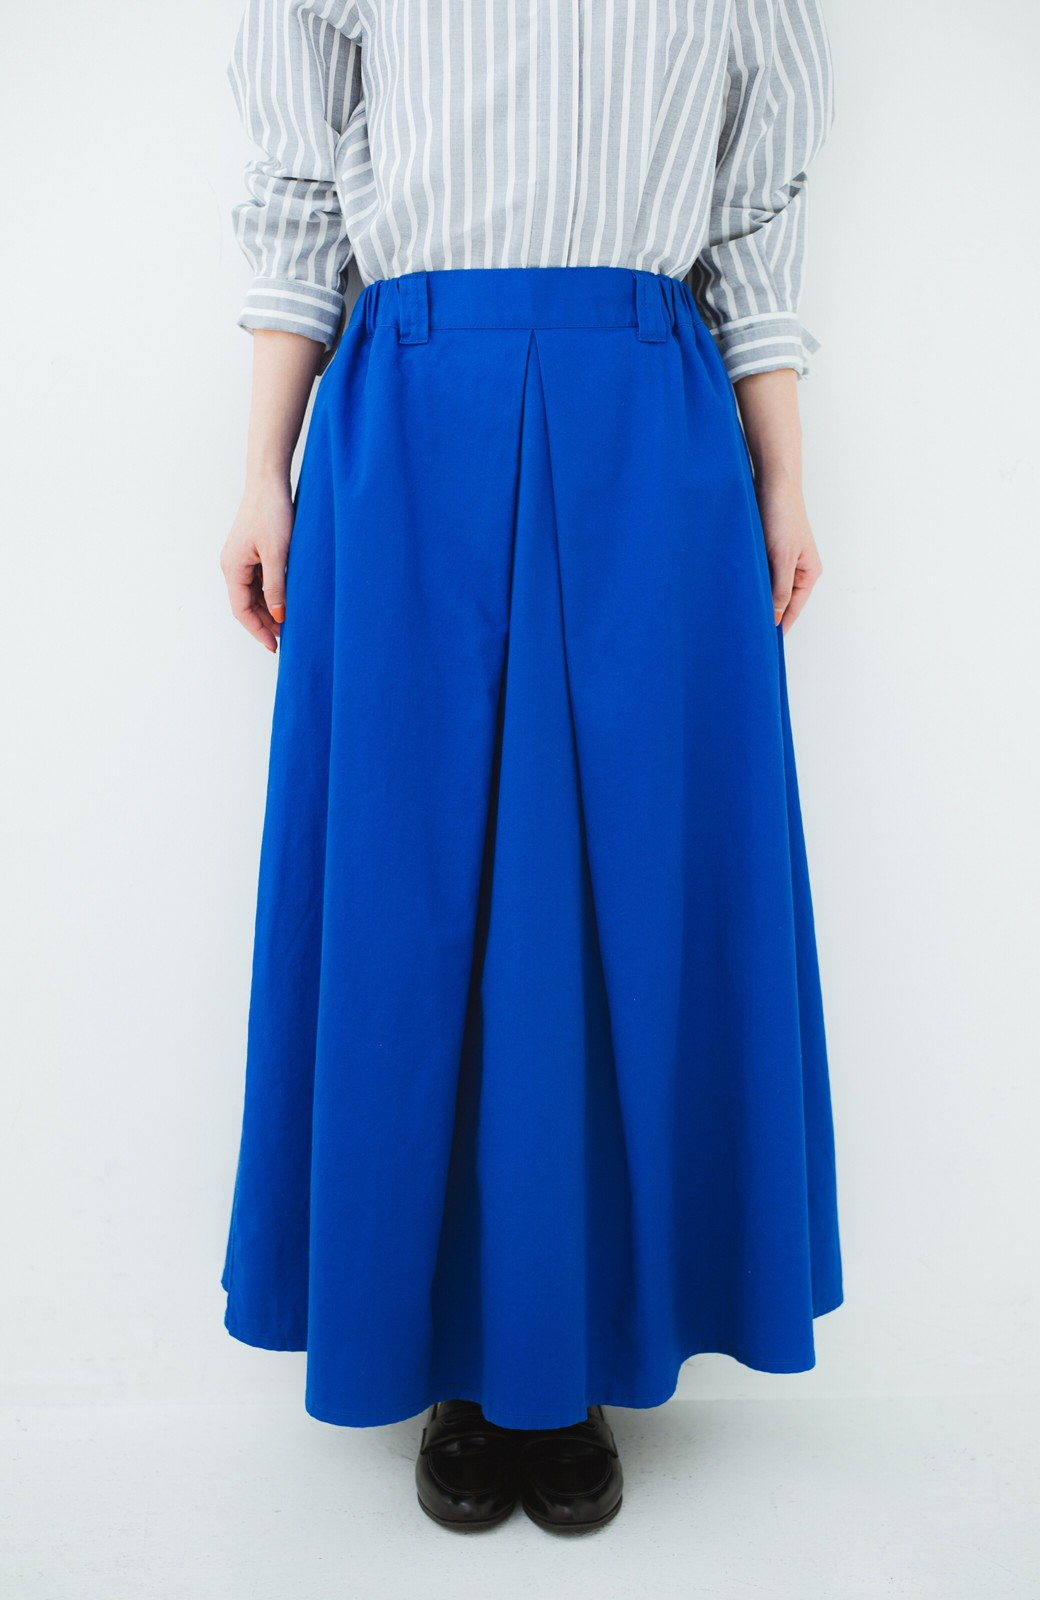 haco! 【今年も再販!】ロングシーズン楽しめる タックボリュームのチノロングスカート <ブルー>の商品写真3